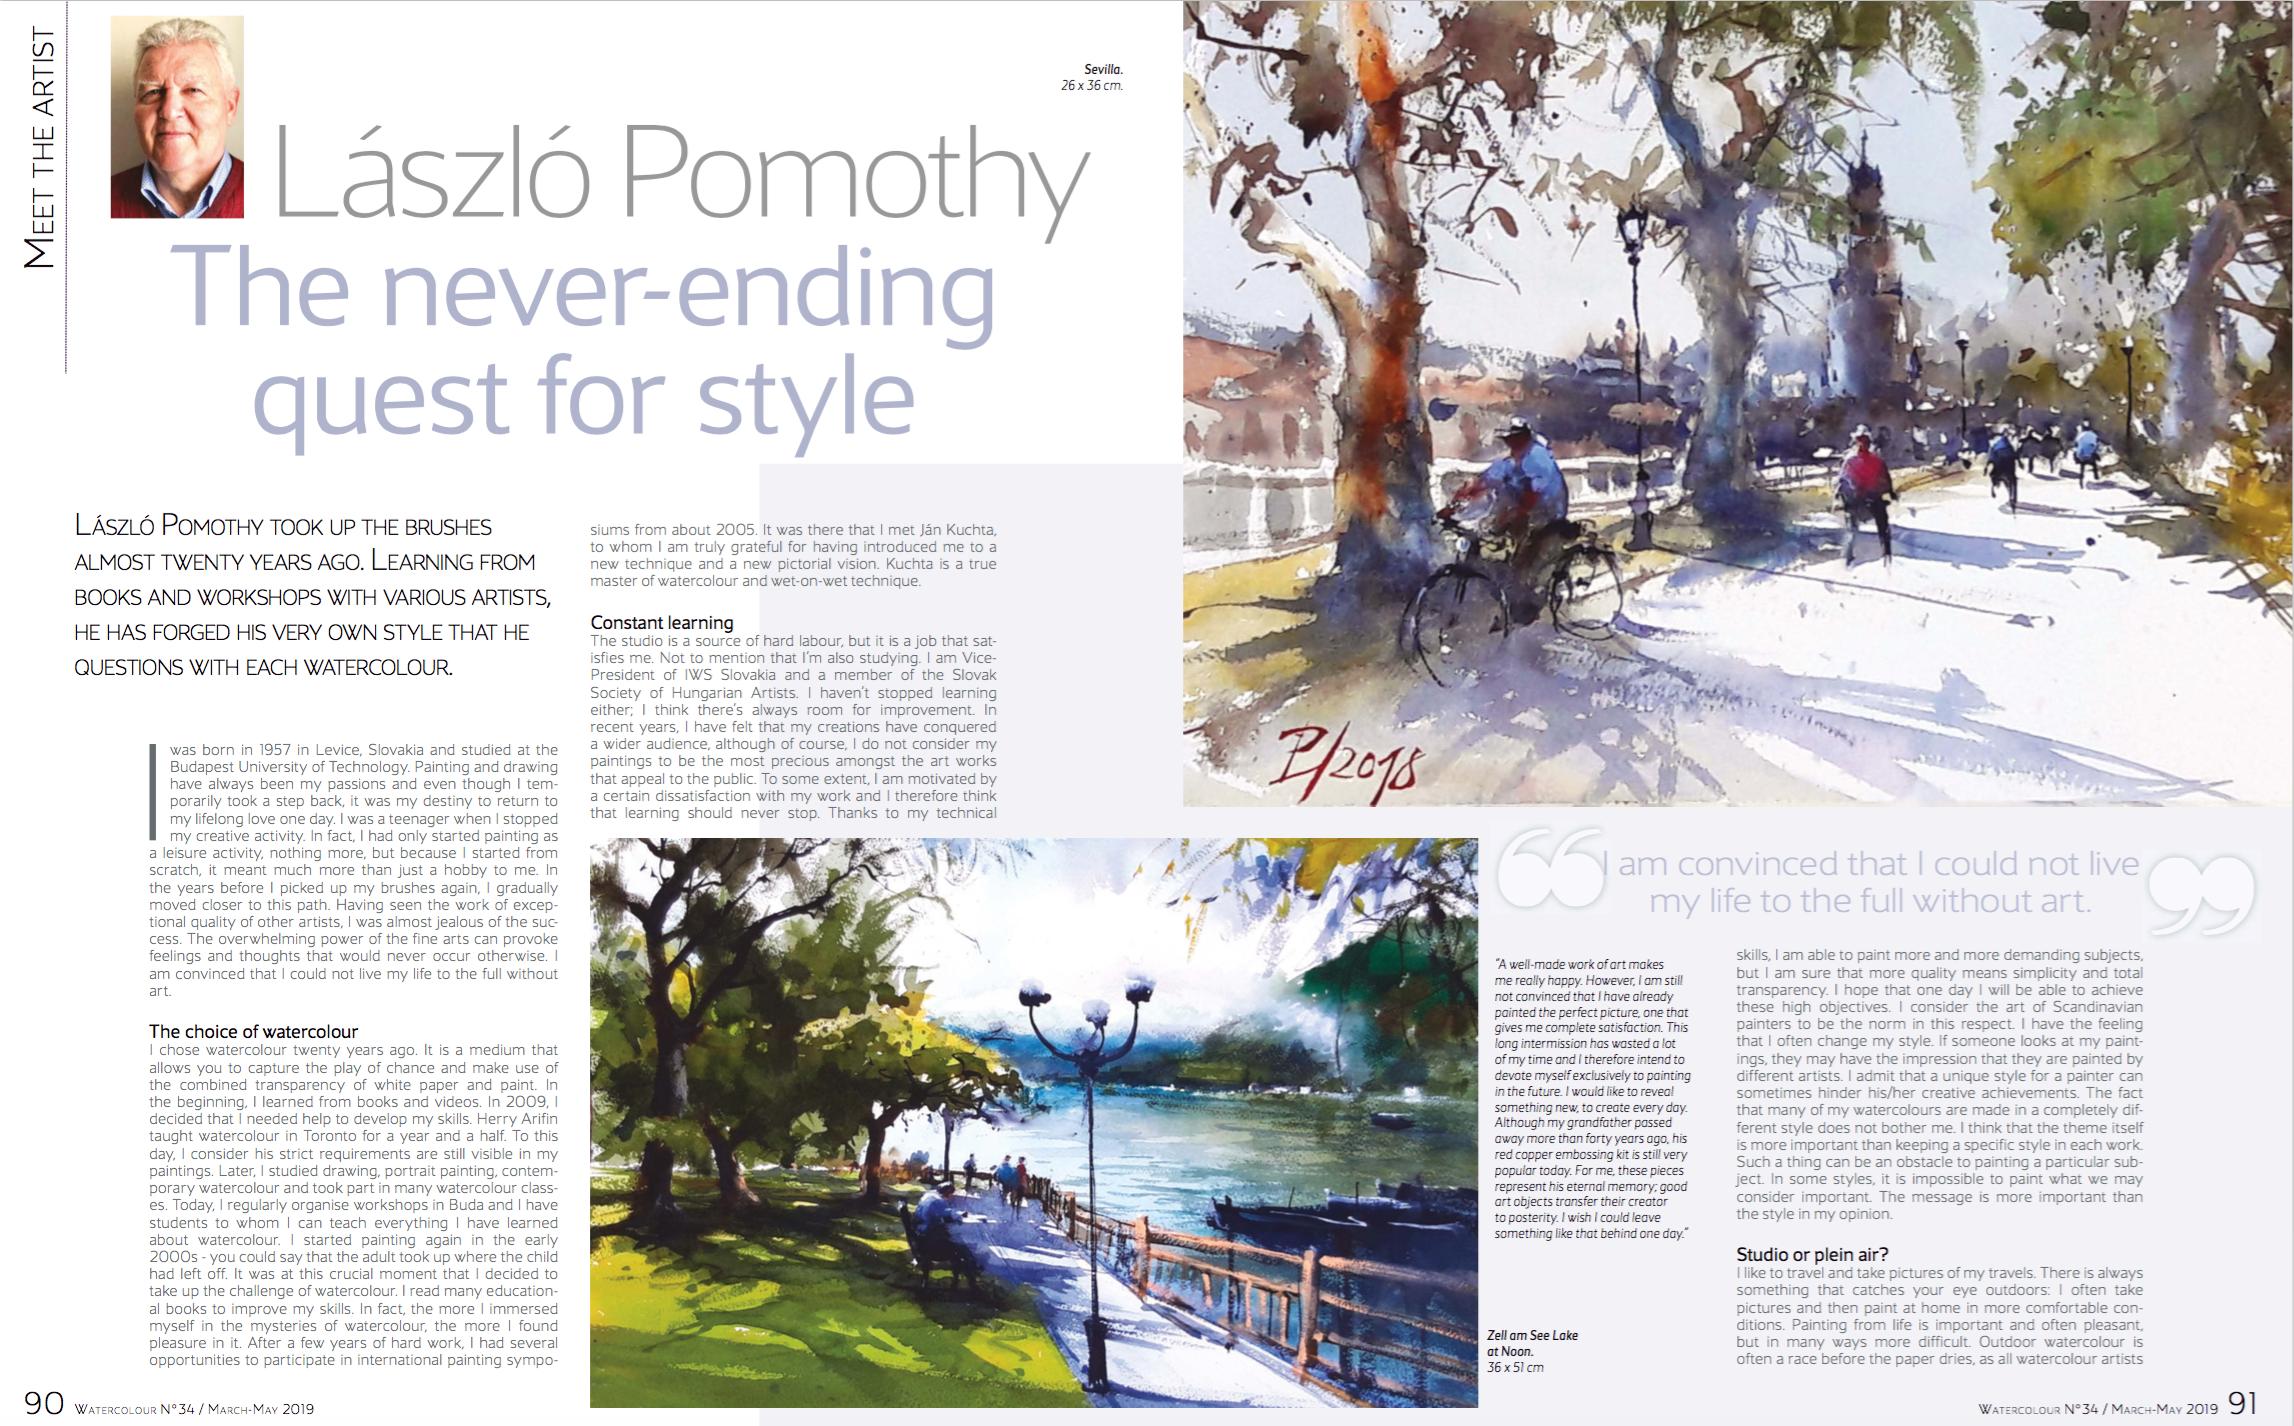 Interview in Art of Watercolor magazine   Pomothy László